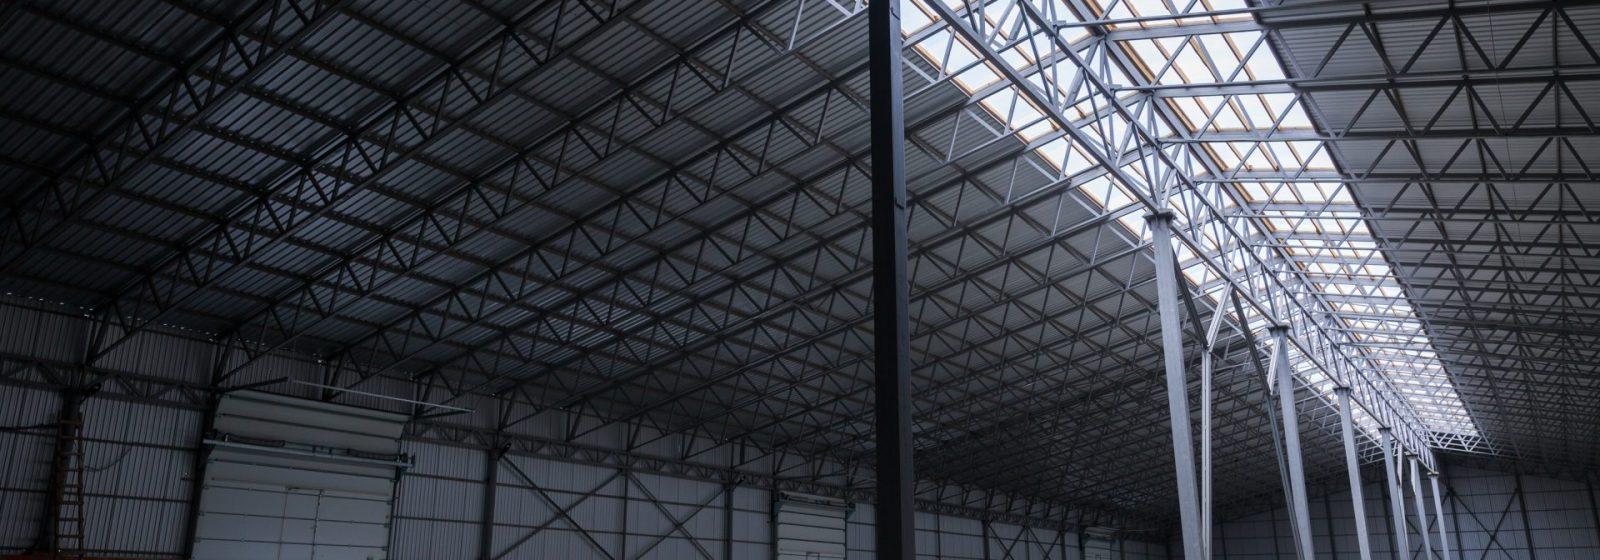 Industrial Warehouse Construction Monitoring - Header Image